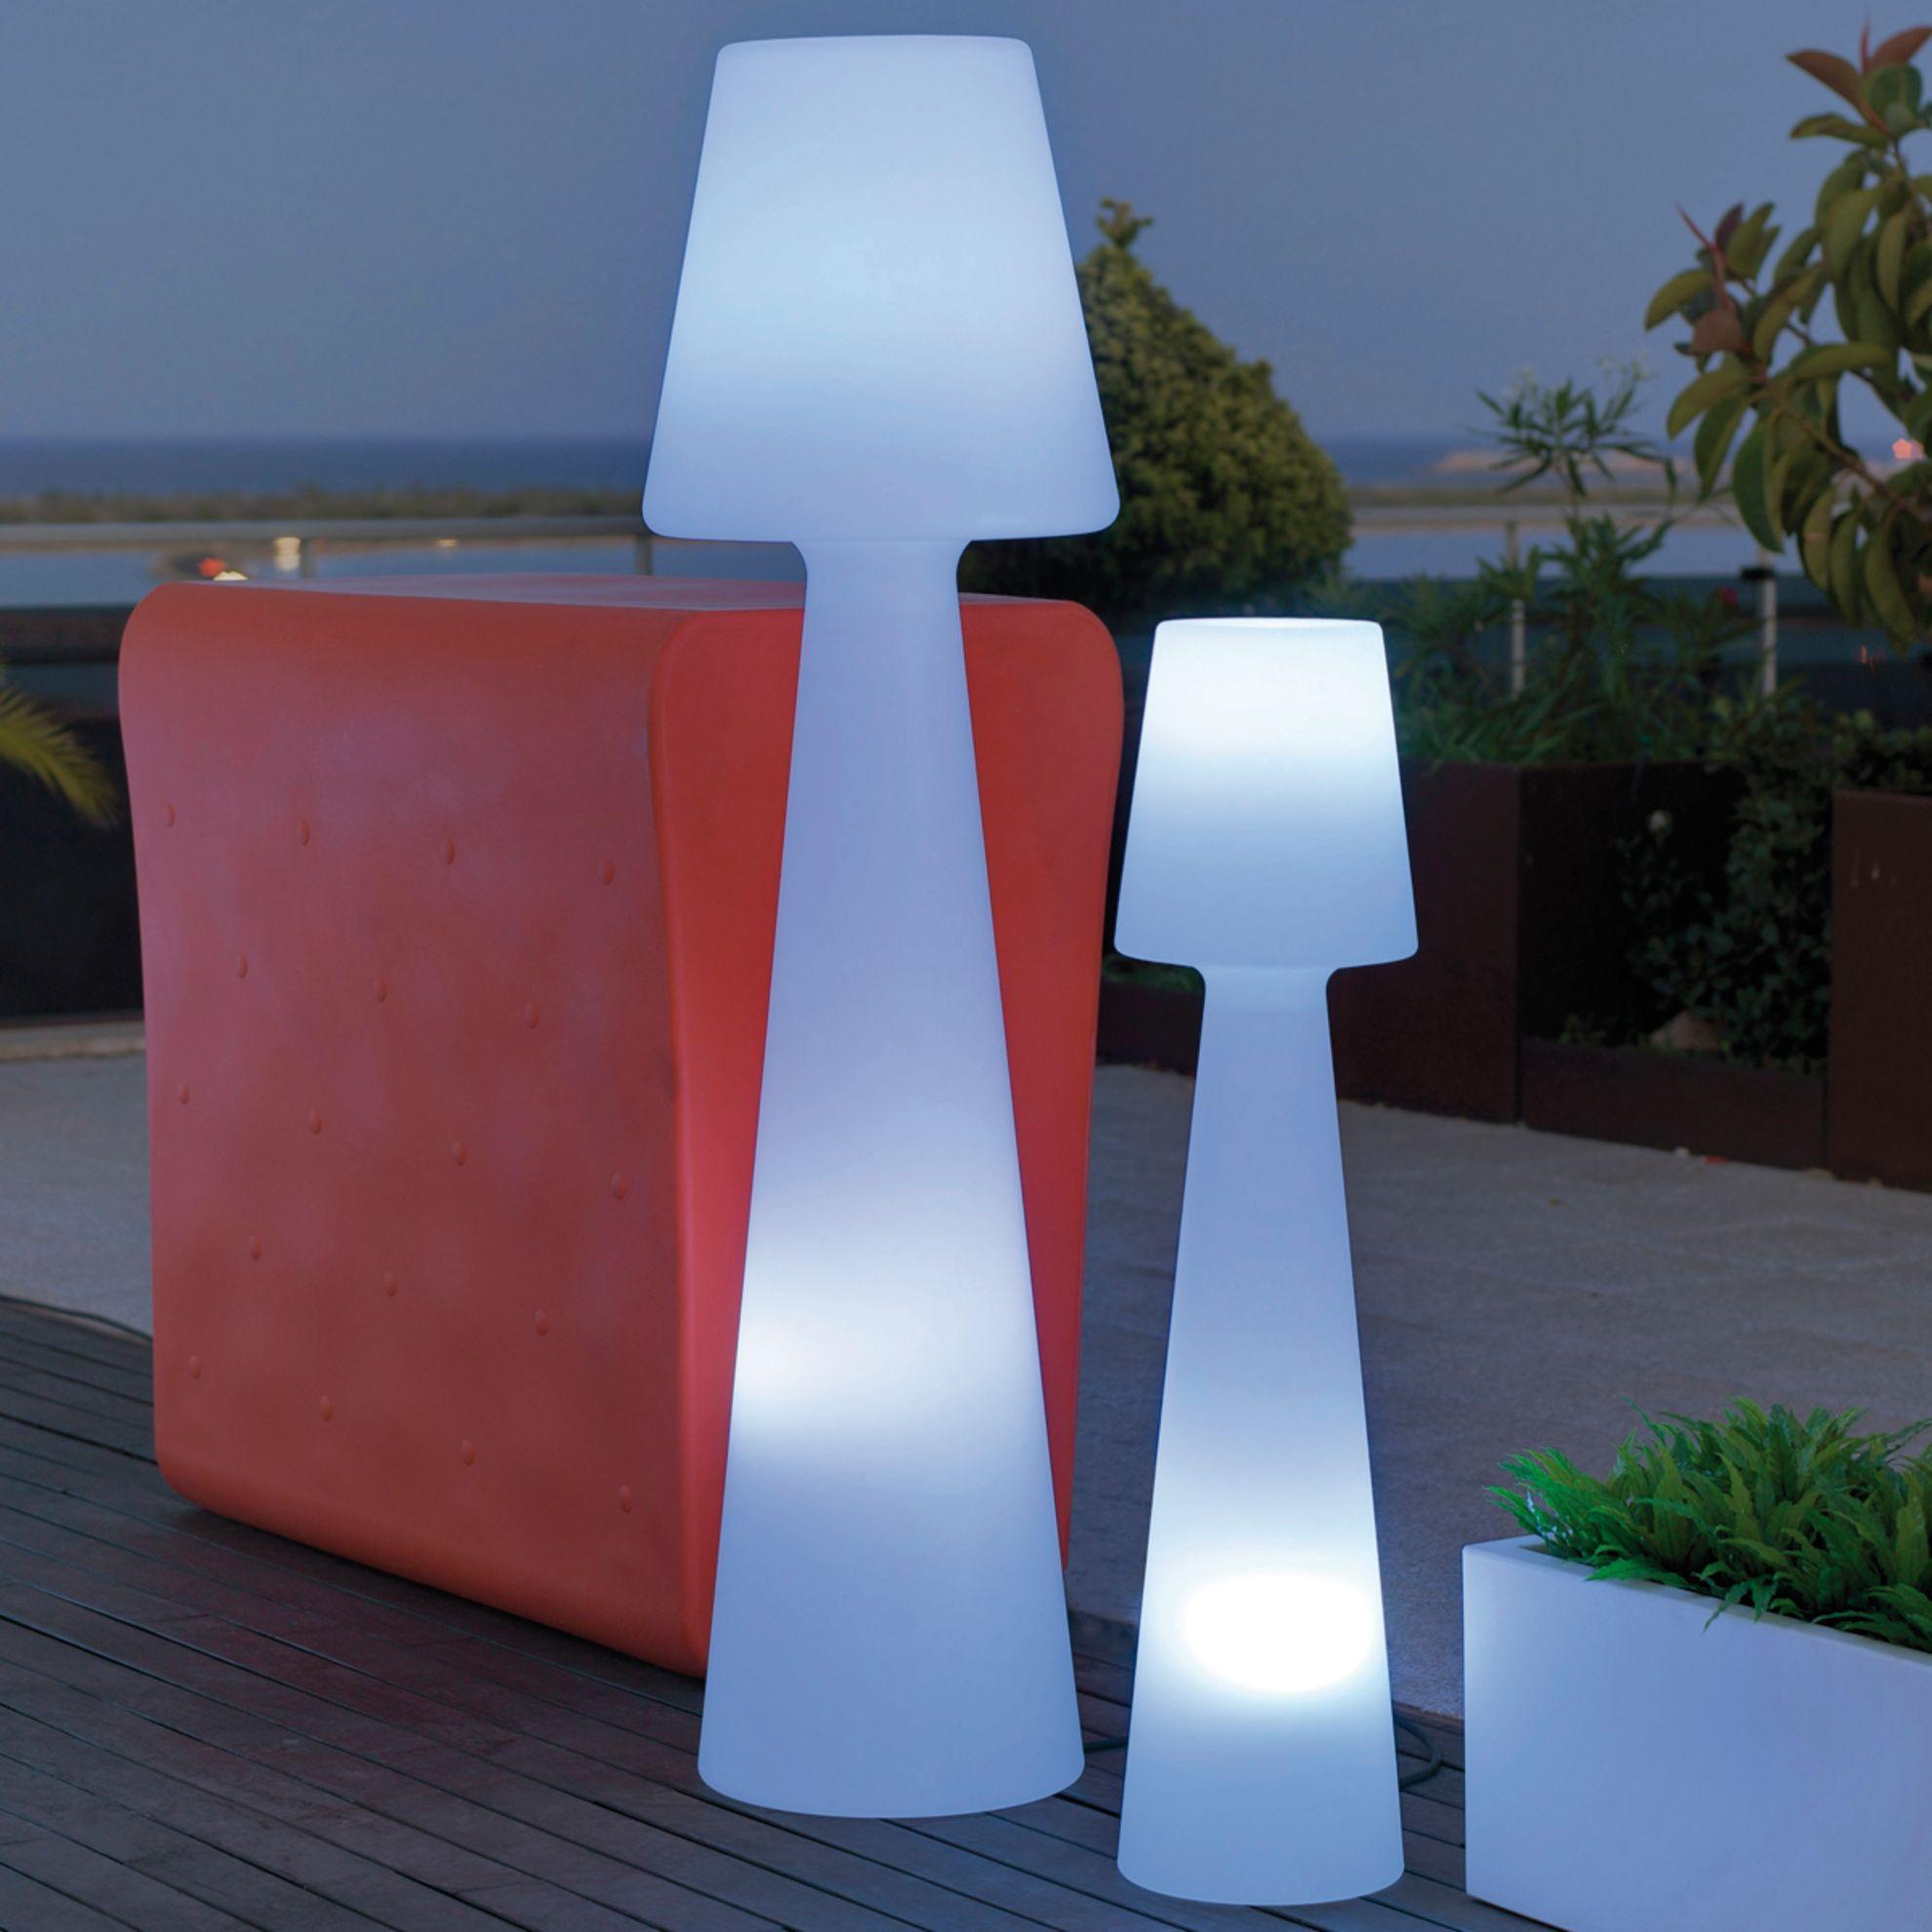 Lampada Da Terra Lampada Da Terra/piantana H110Cm, In ... destiné Eclairage De Jardin Leroy Merlin